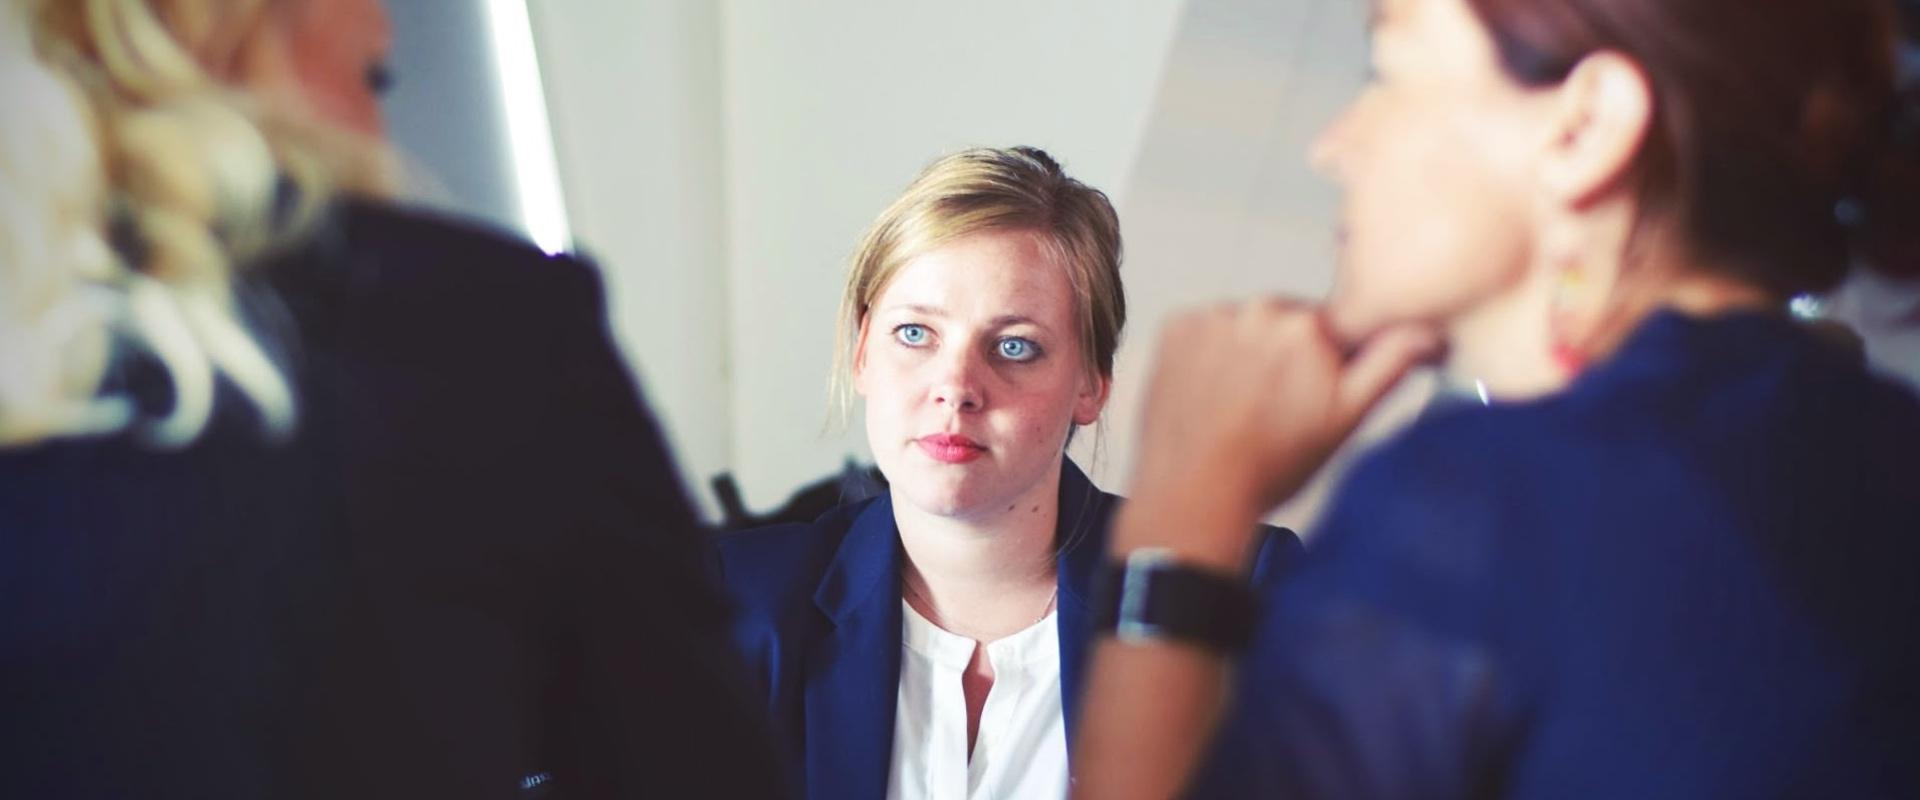 William Almonte - How To Identify The Efficient Recruiter